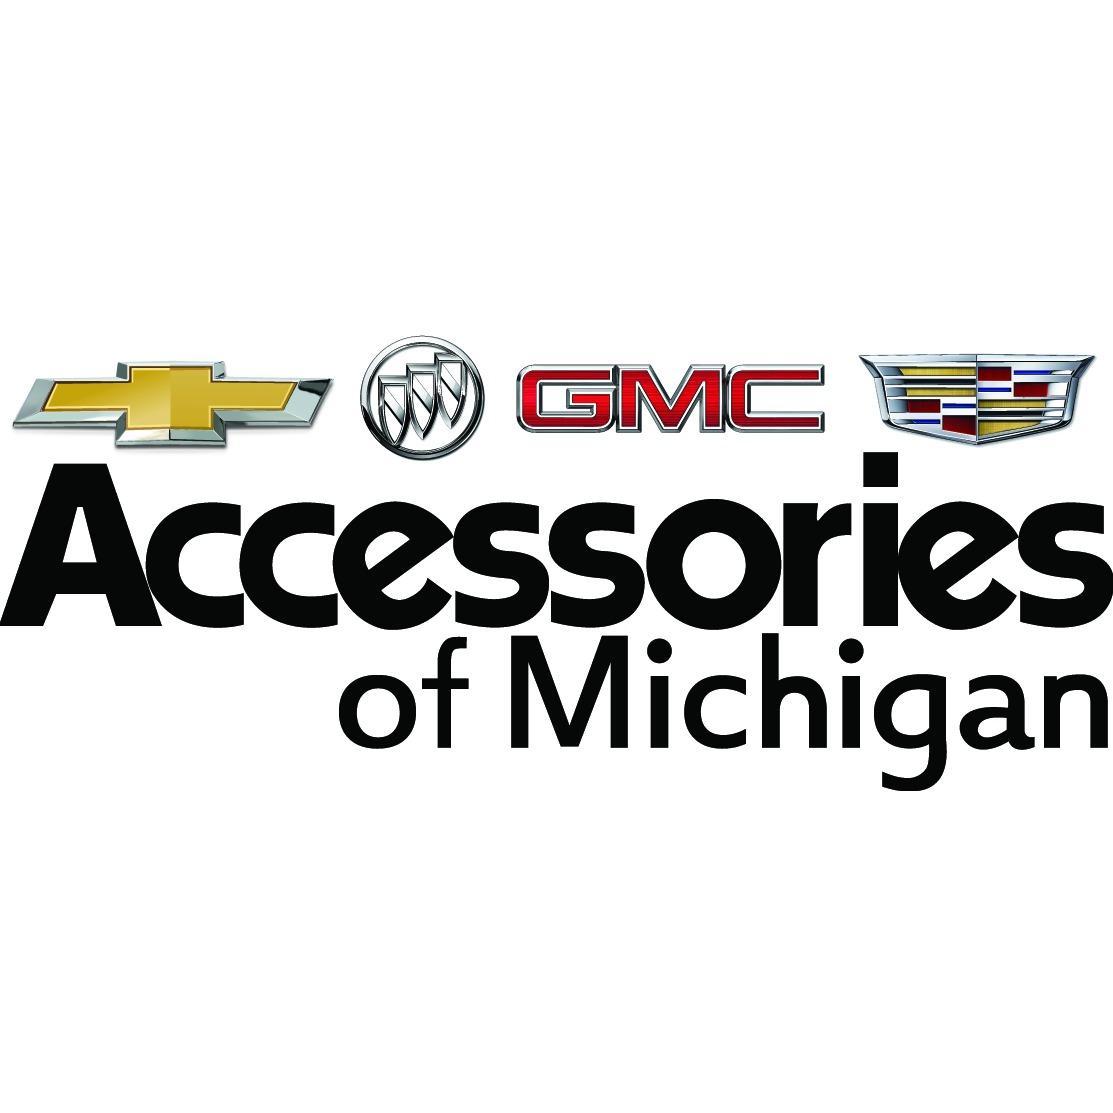 Accessories of Michigan